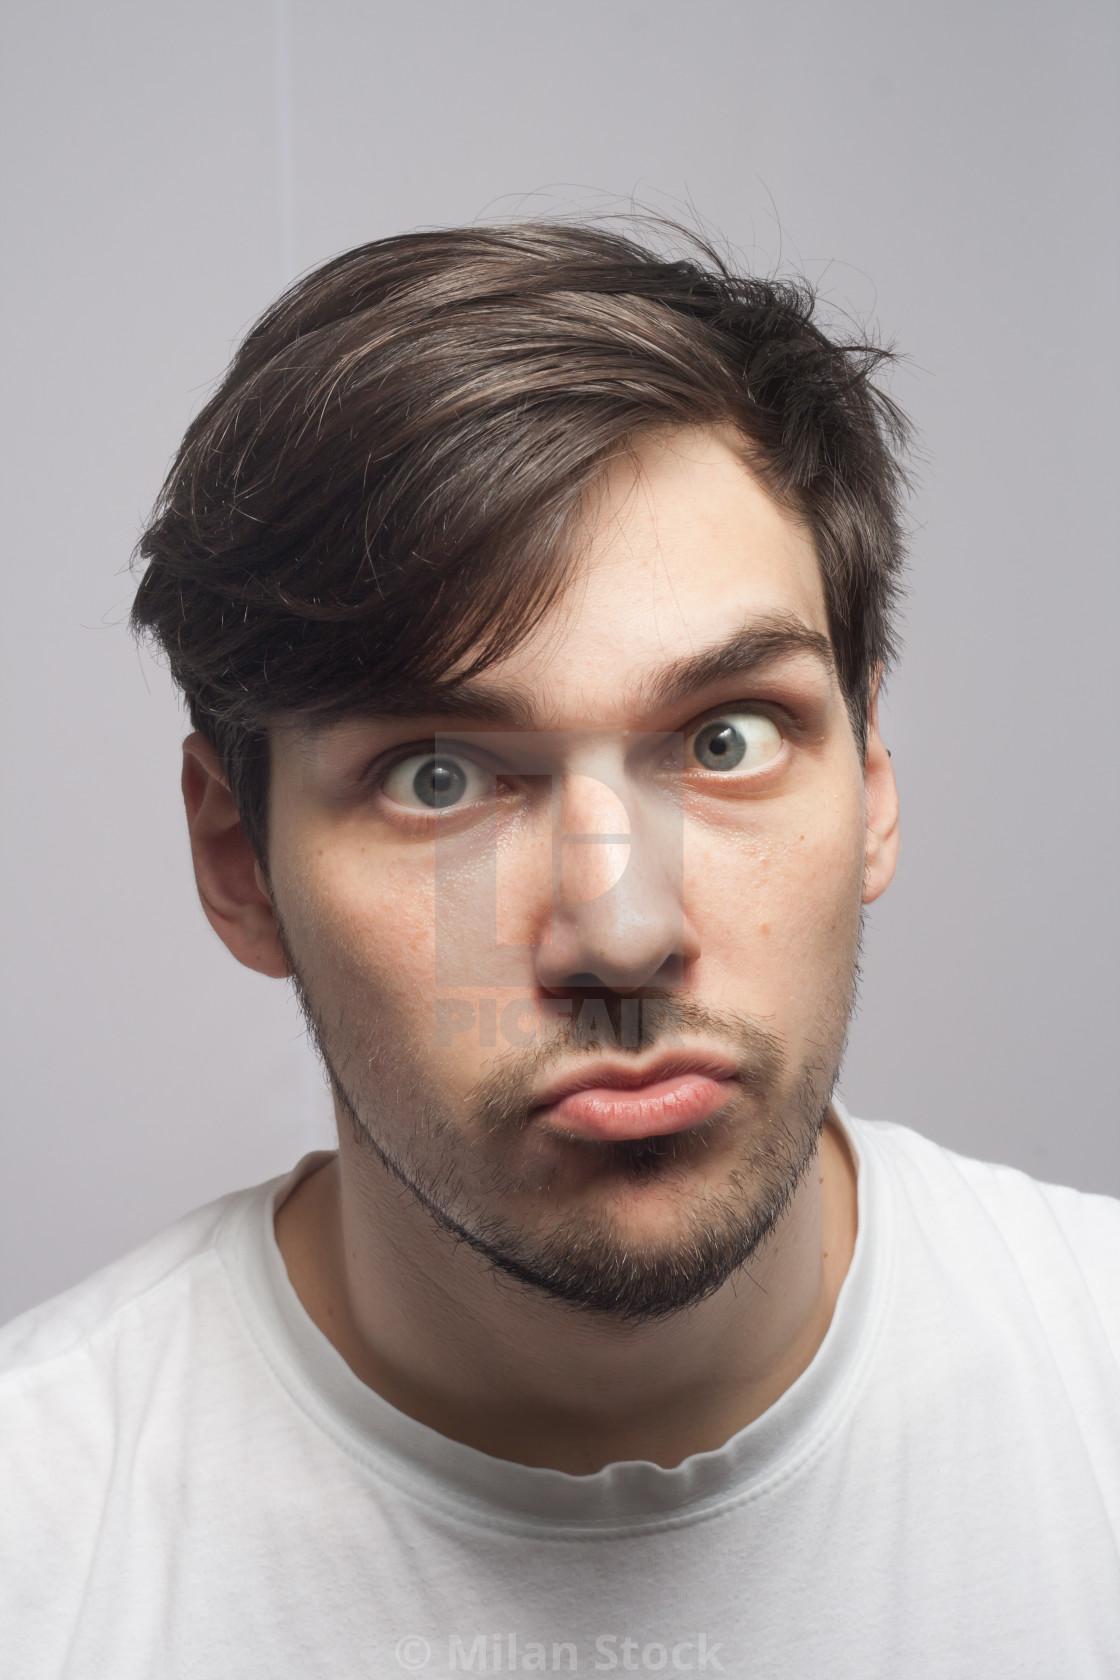 """Man portrait cross squint skew eye portrait."" stock image"